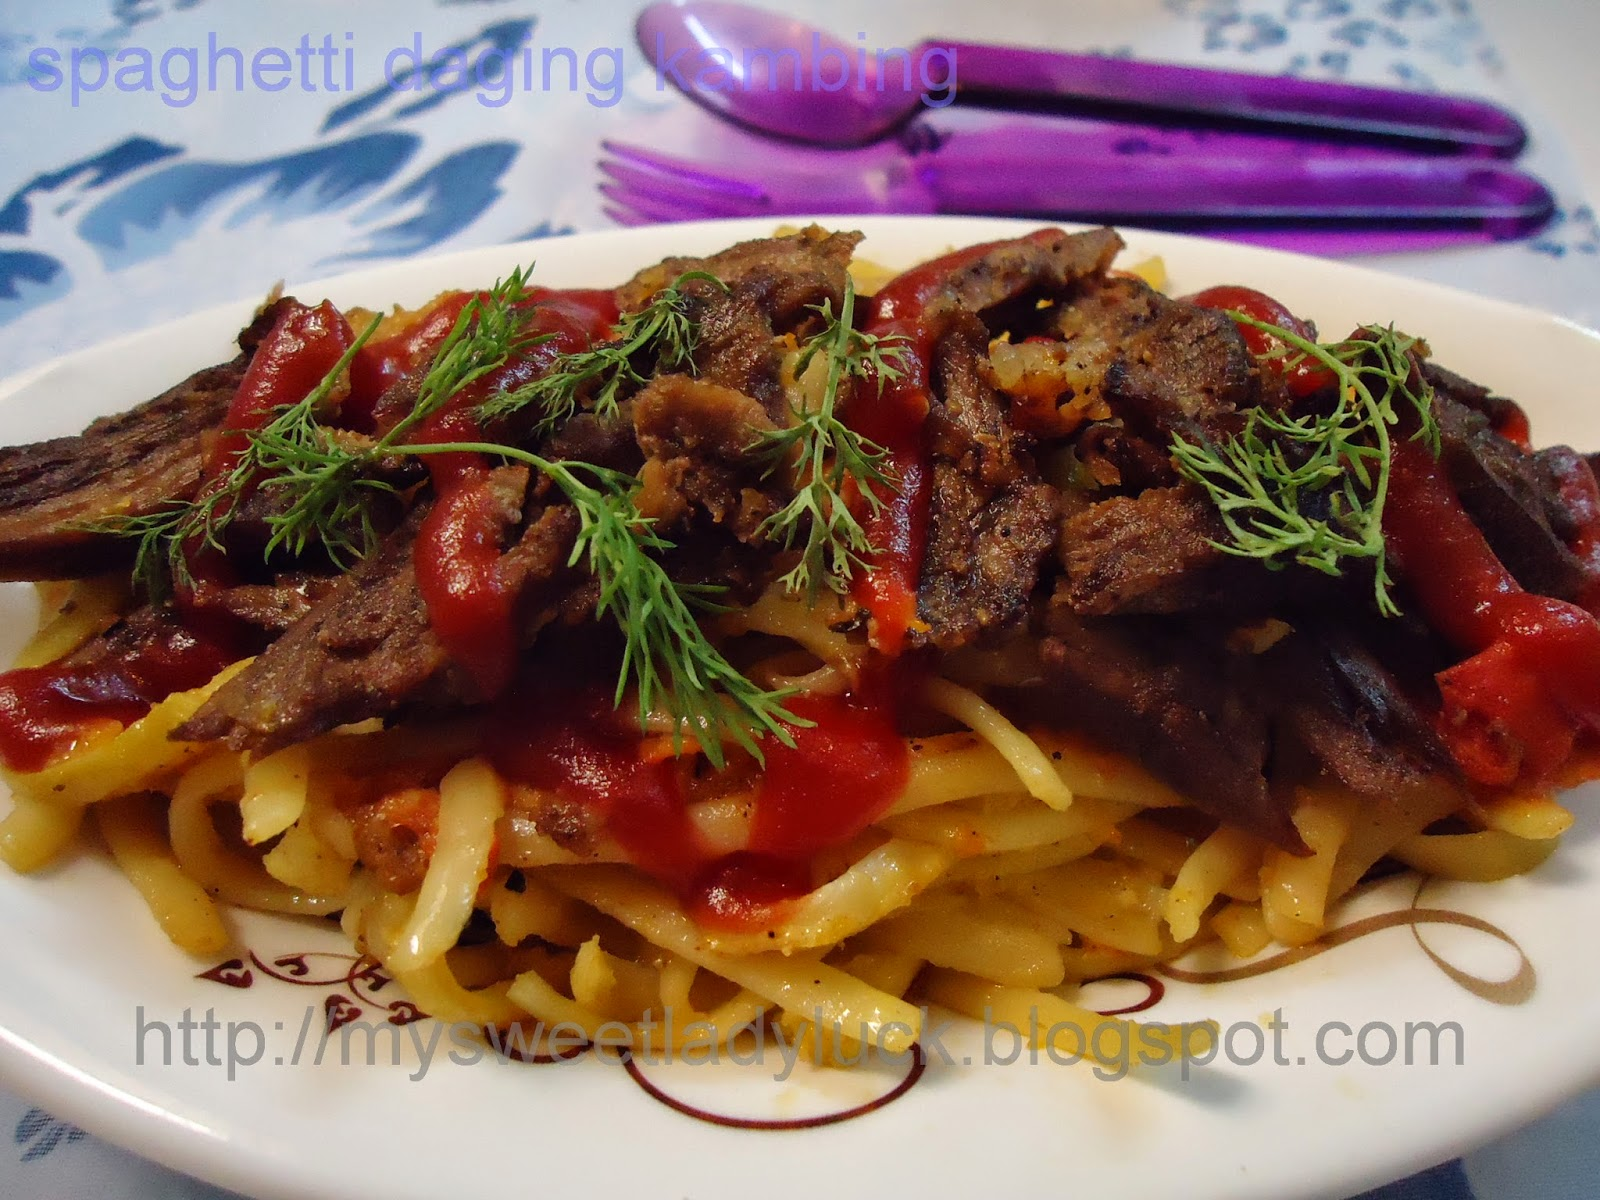 spaghetti daging kambing